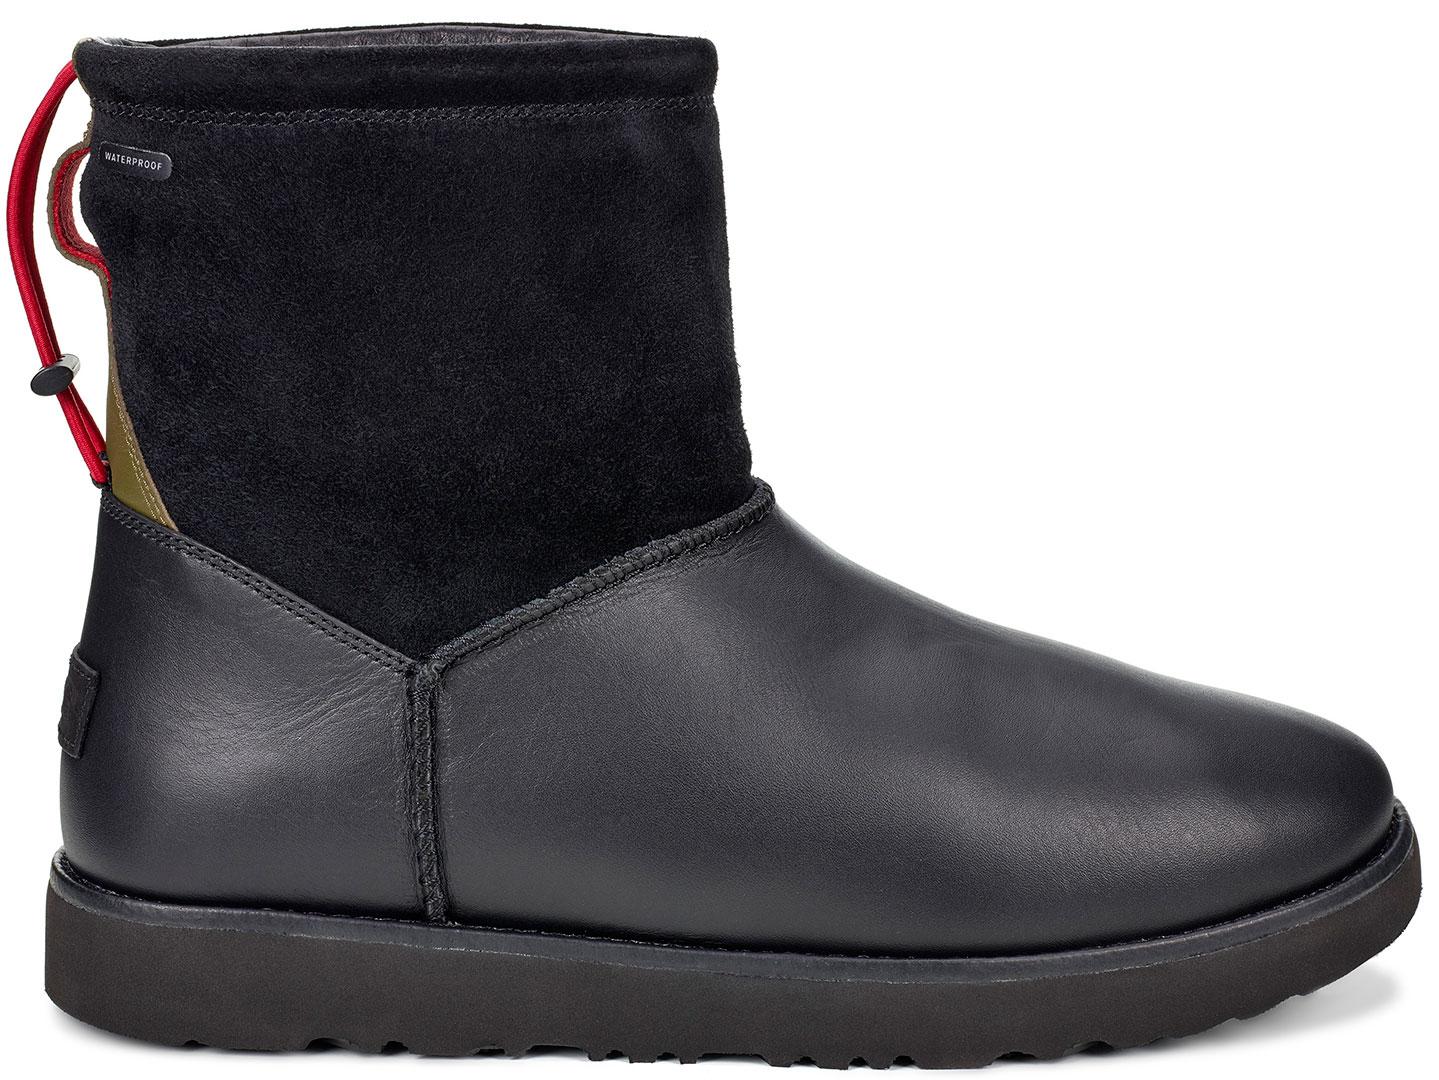 ca41929276a CLASSIC TOGGLE WATERPROOF Boot 2019 black